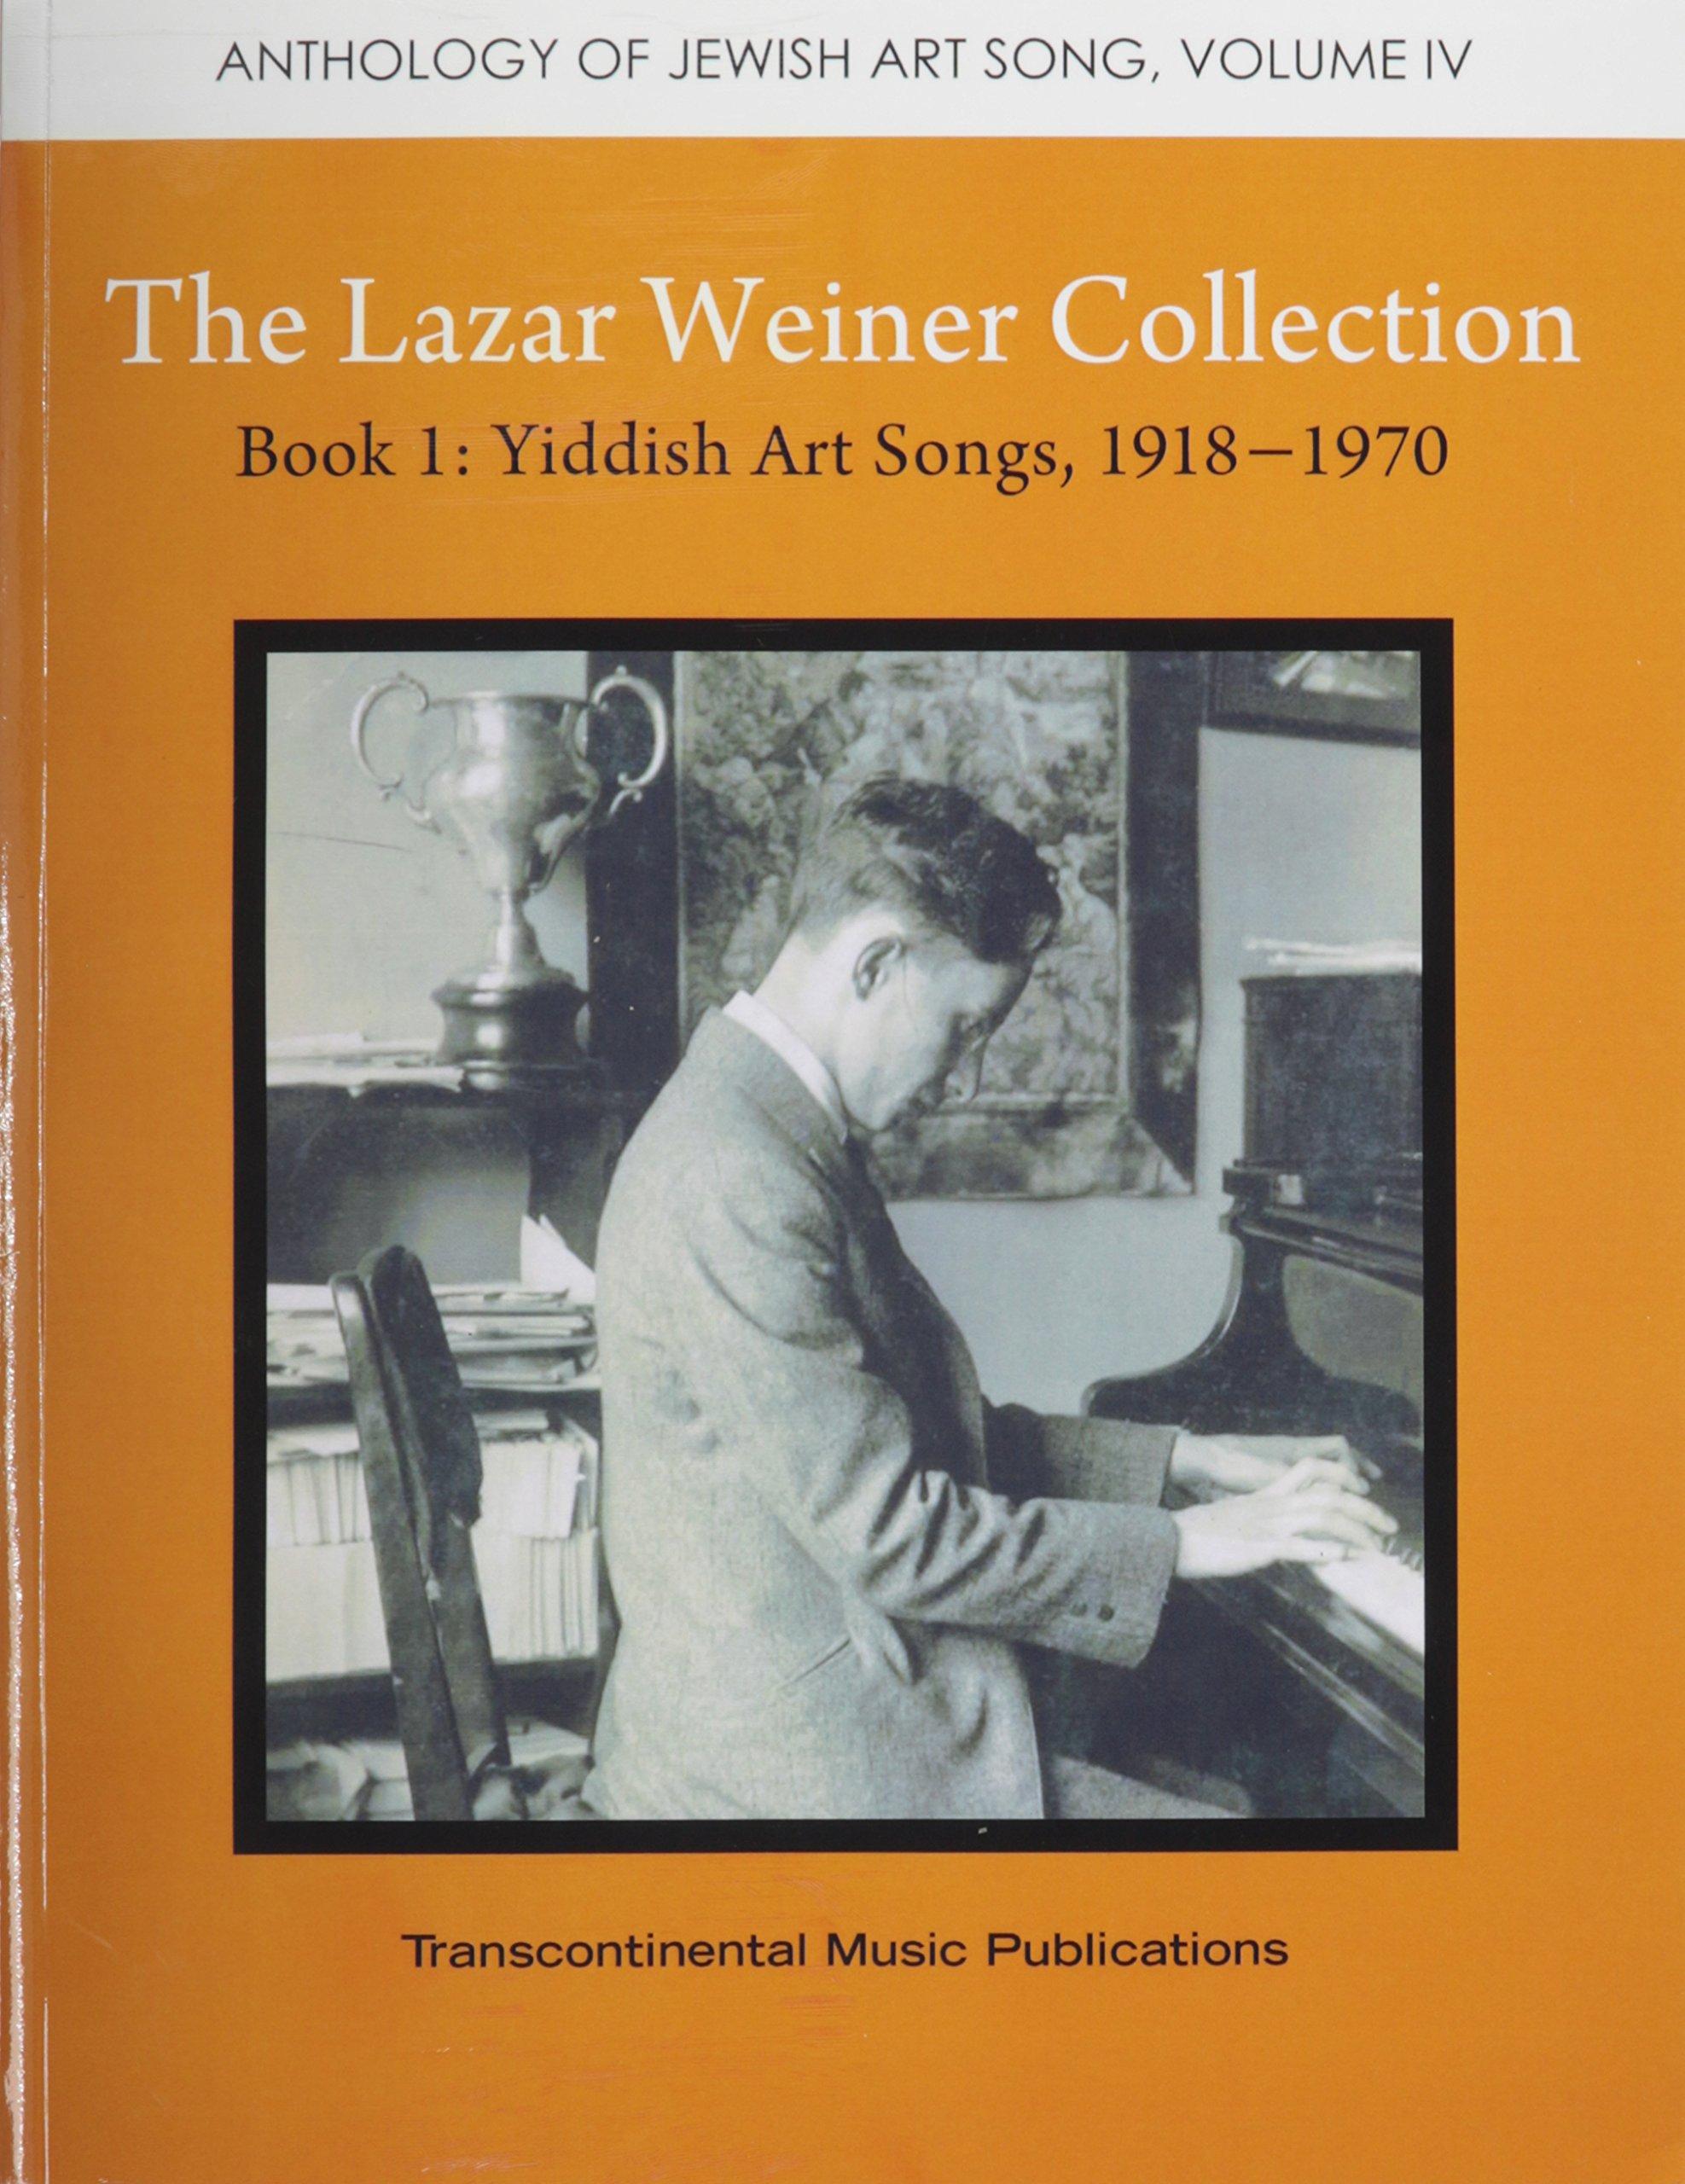 Lazar Weiner Collection Bk 1: Yiddish Art Songs 1918-1970 (Anth Jewish Art Song V4) (Anthology of Jewish Art Song)